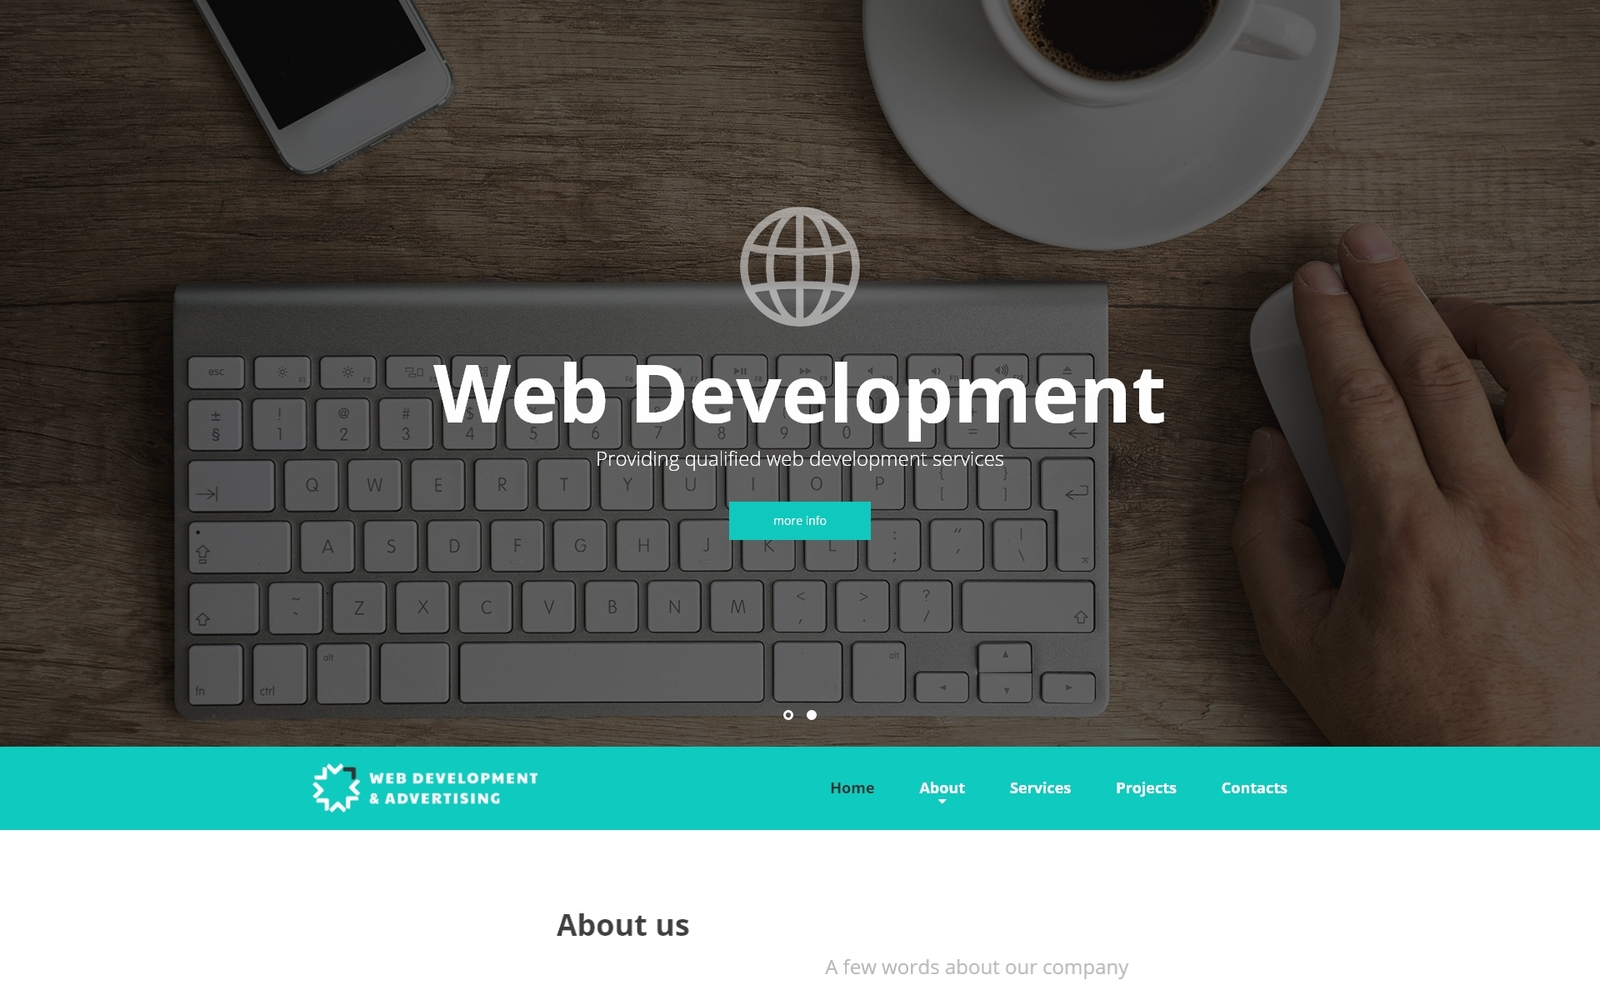 """Web Development & Advertising - Web Development Responsive Website Template"" 响应式网页模板 #52537"